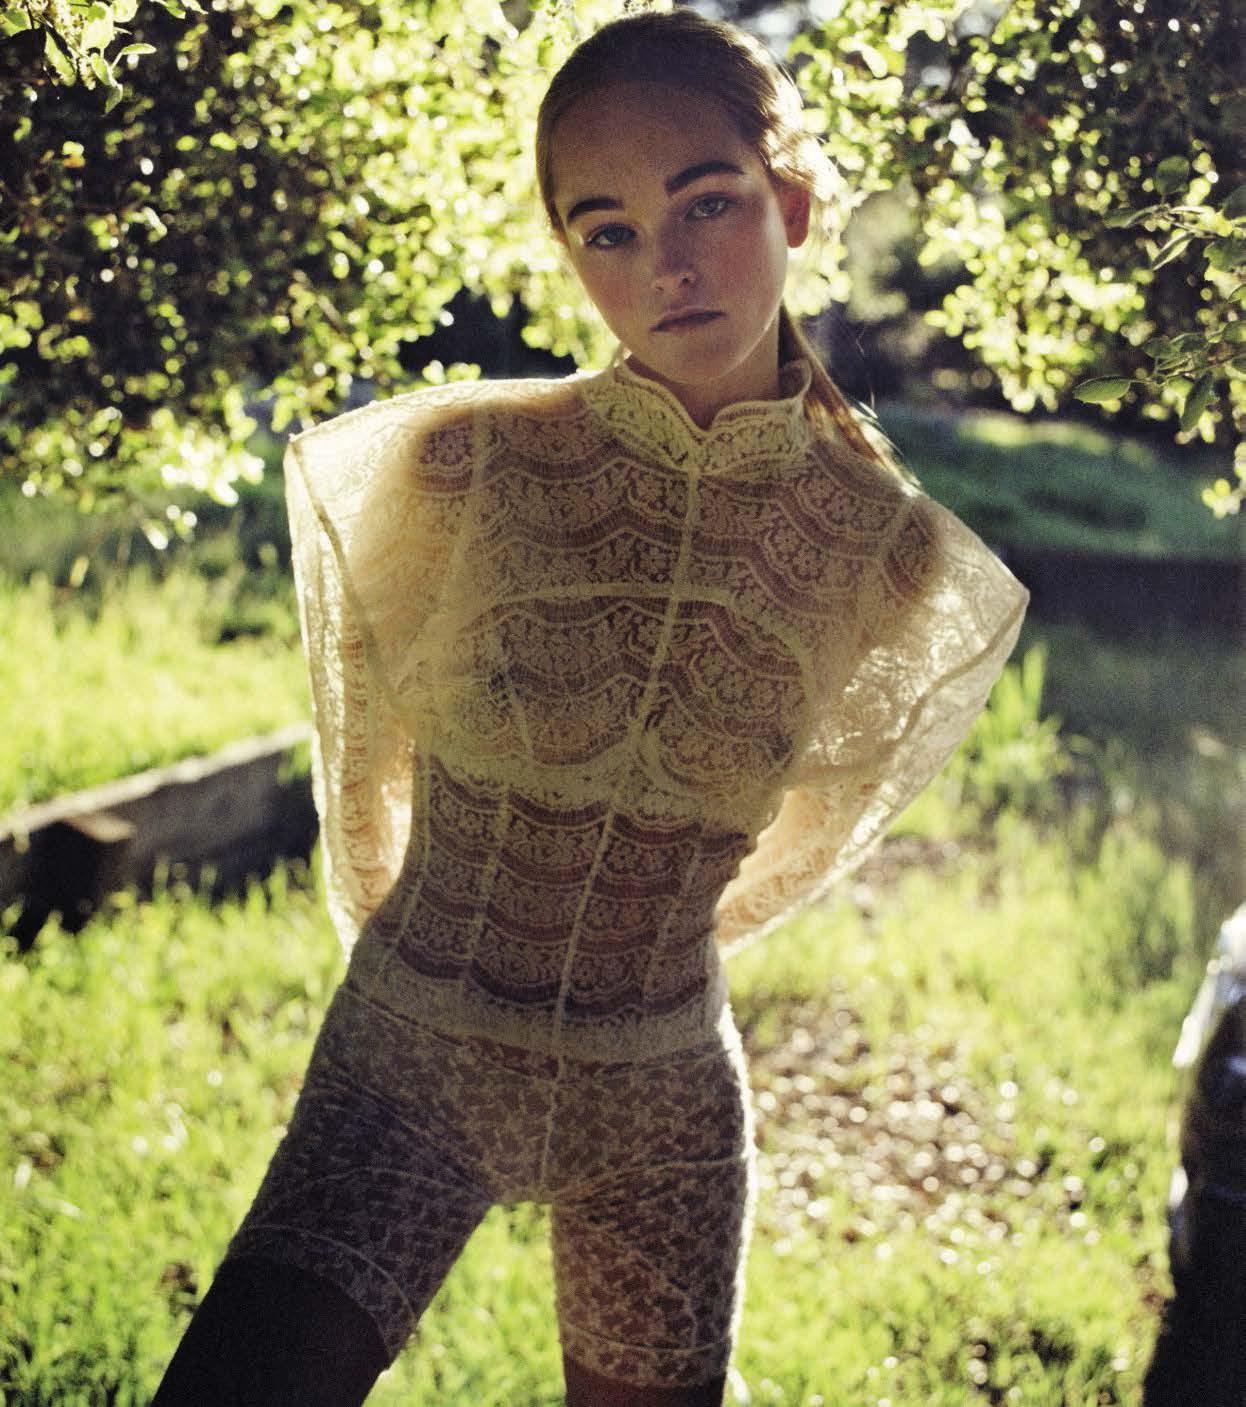 Vogue Italia May 2017 / модель Jean Campbell / фотограф Zoe Ghertner